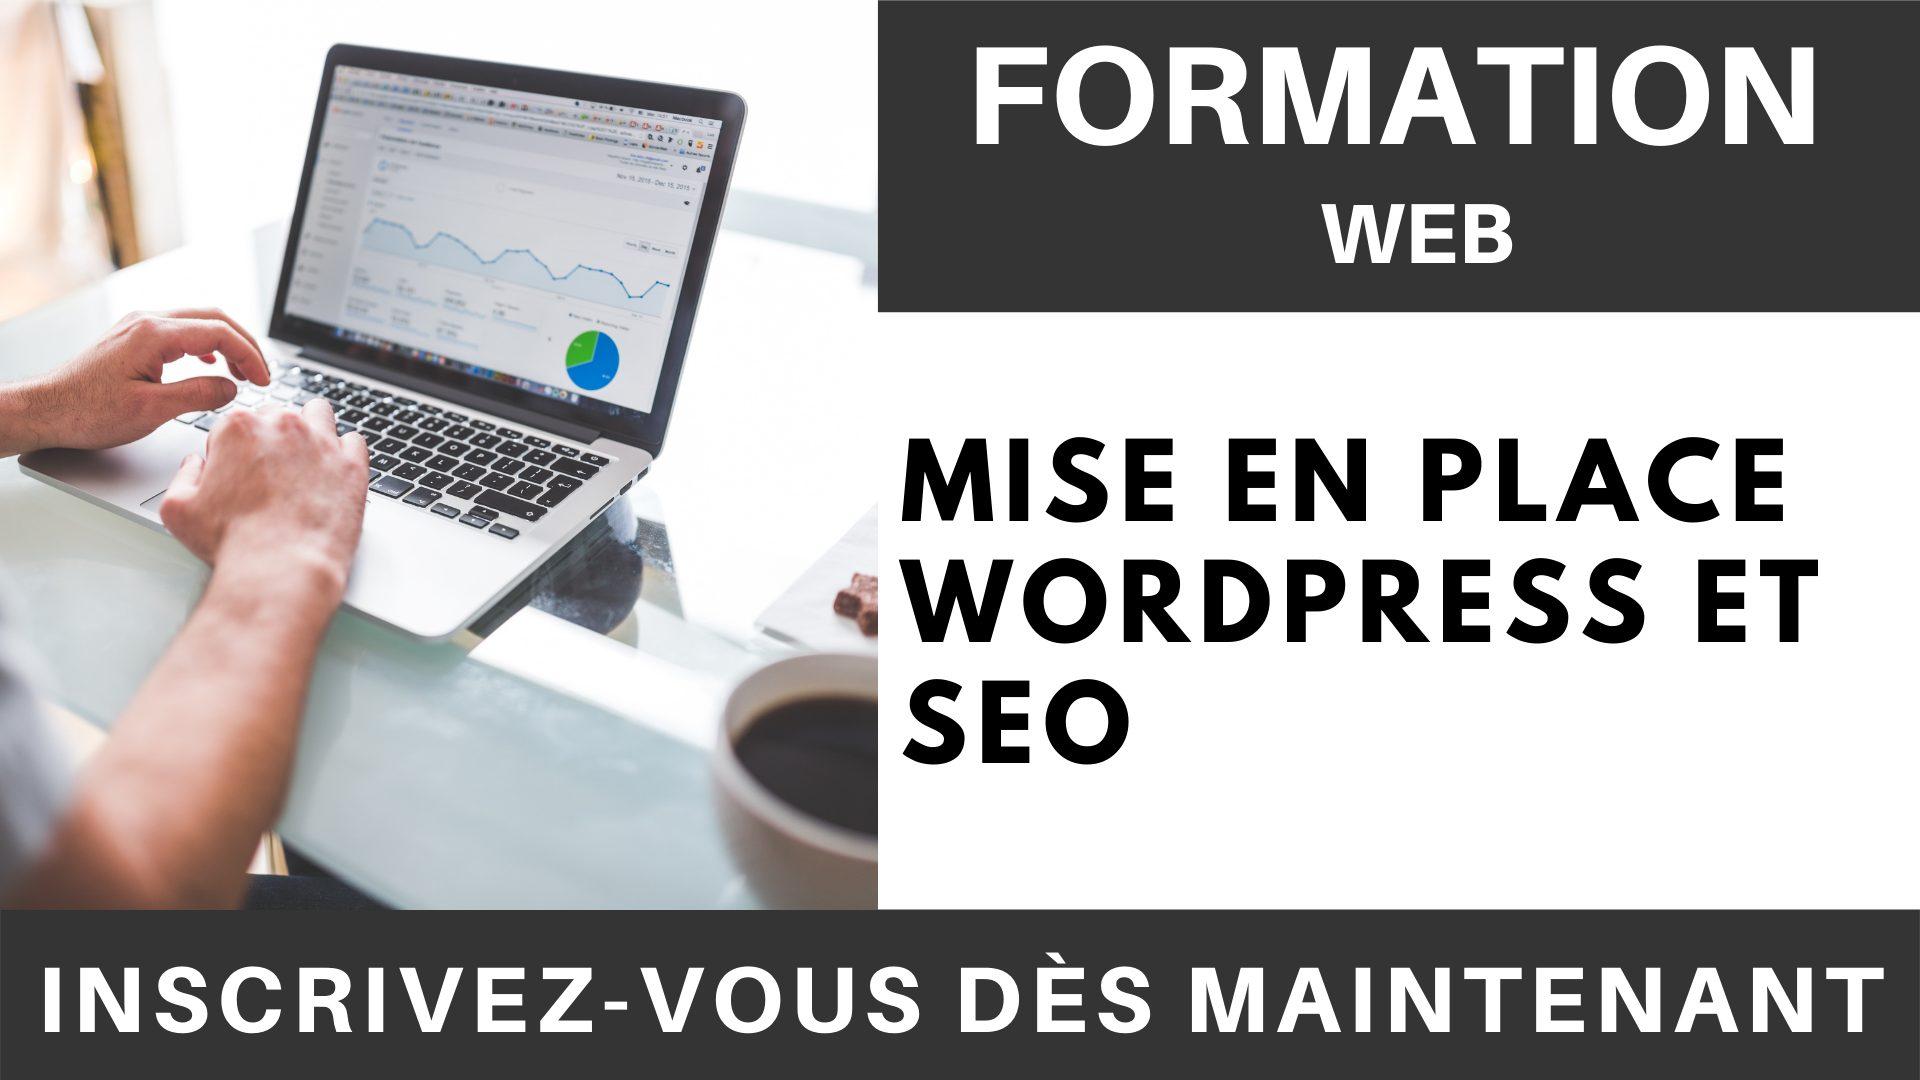 Formation WEB - Mise en place WordPress et SEO